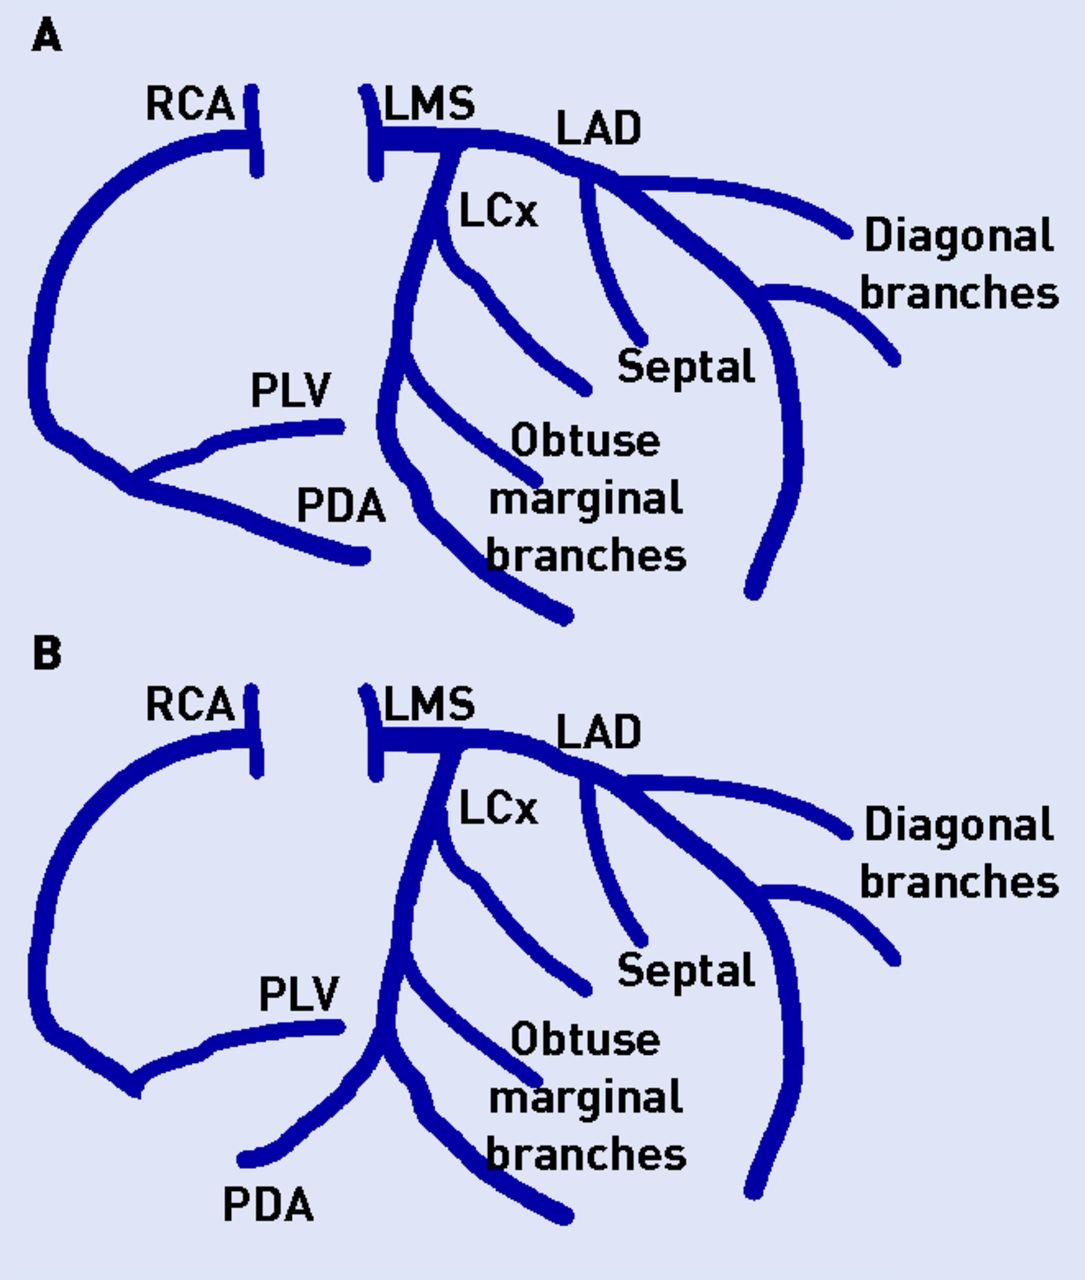 Interpretation of cardiac catheterisation reports: a guide